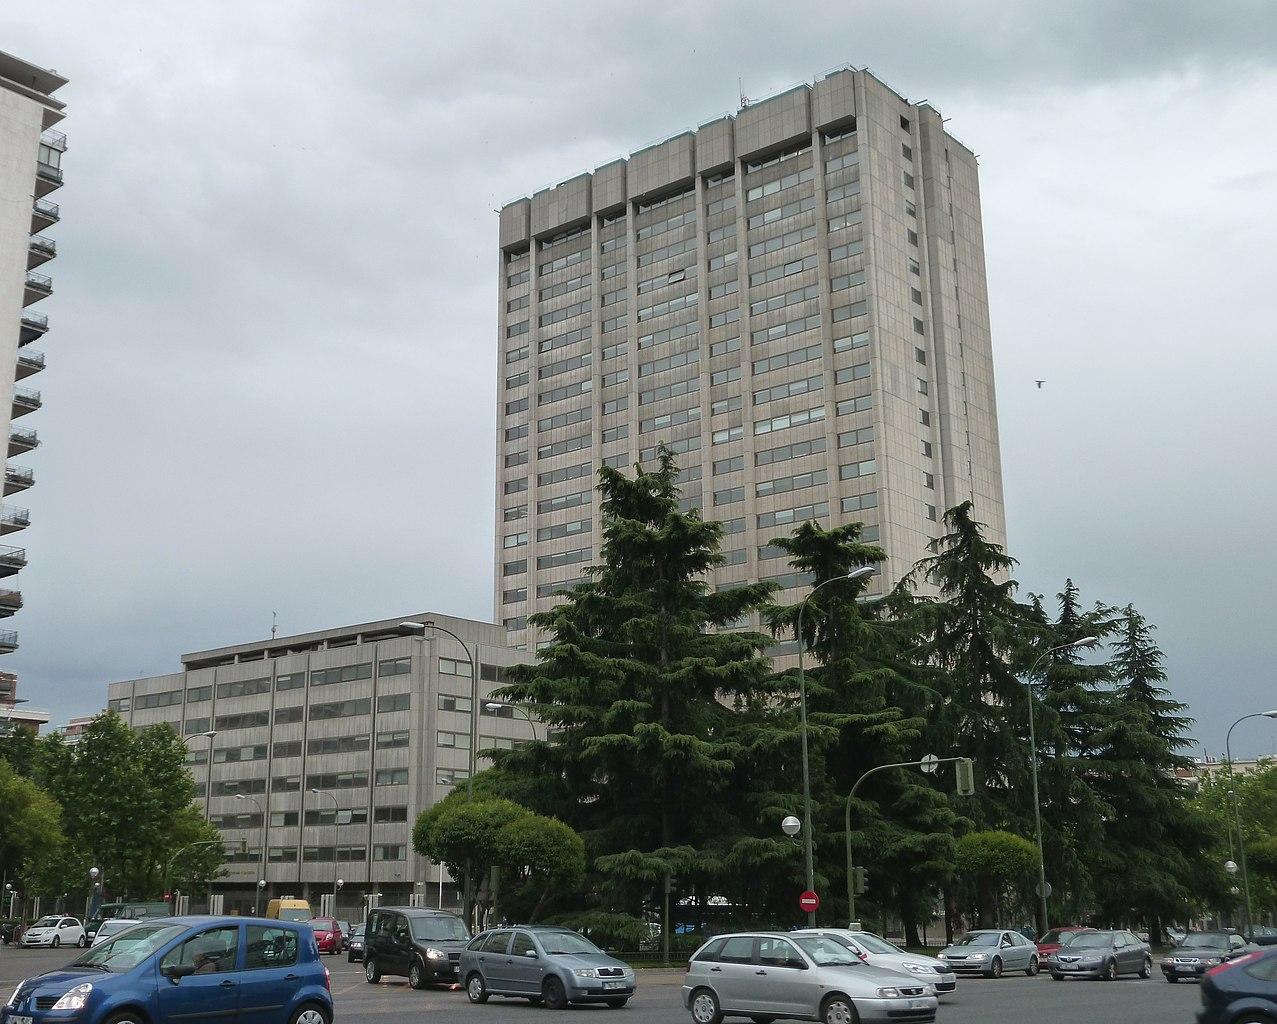 File ministerio de industria energ a y turismo de espa a for Ministerio de seguridad espana